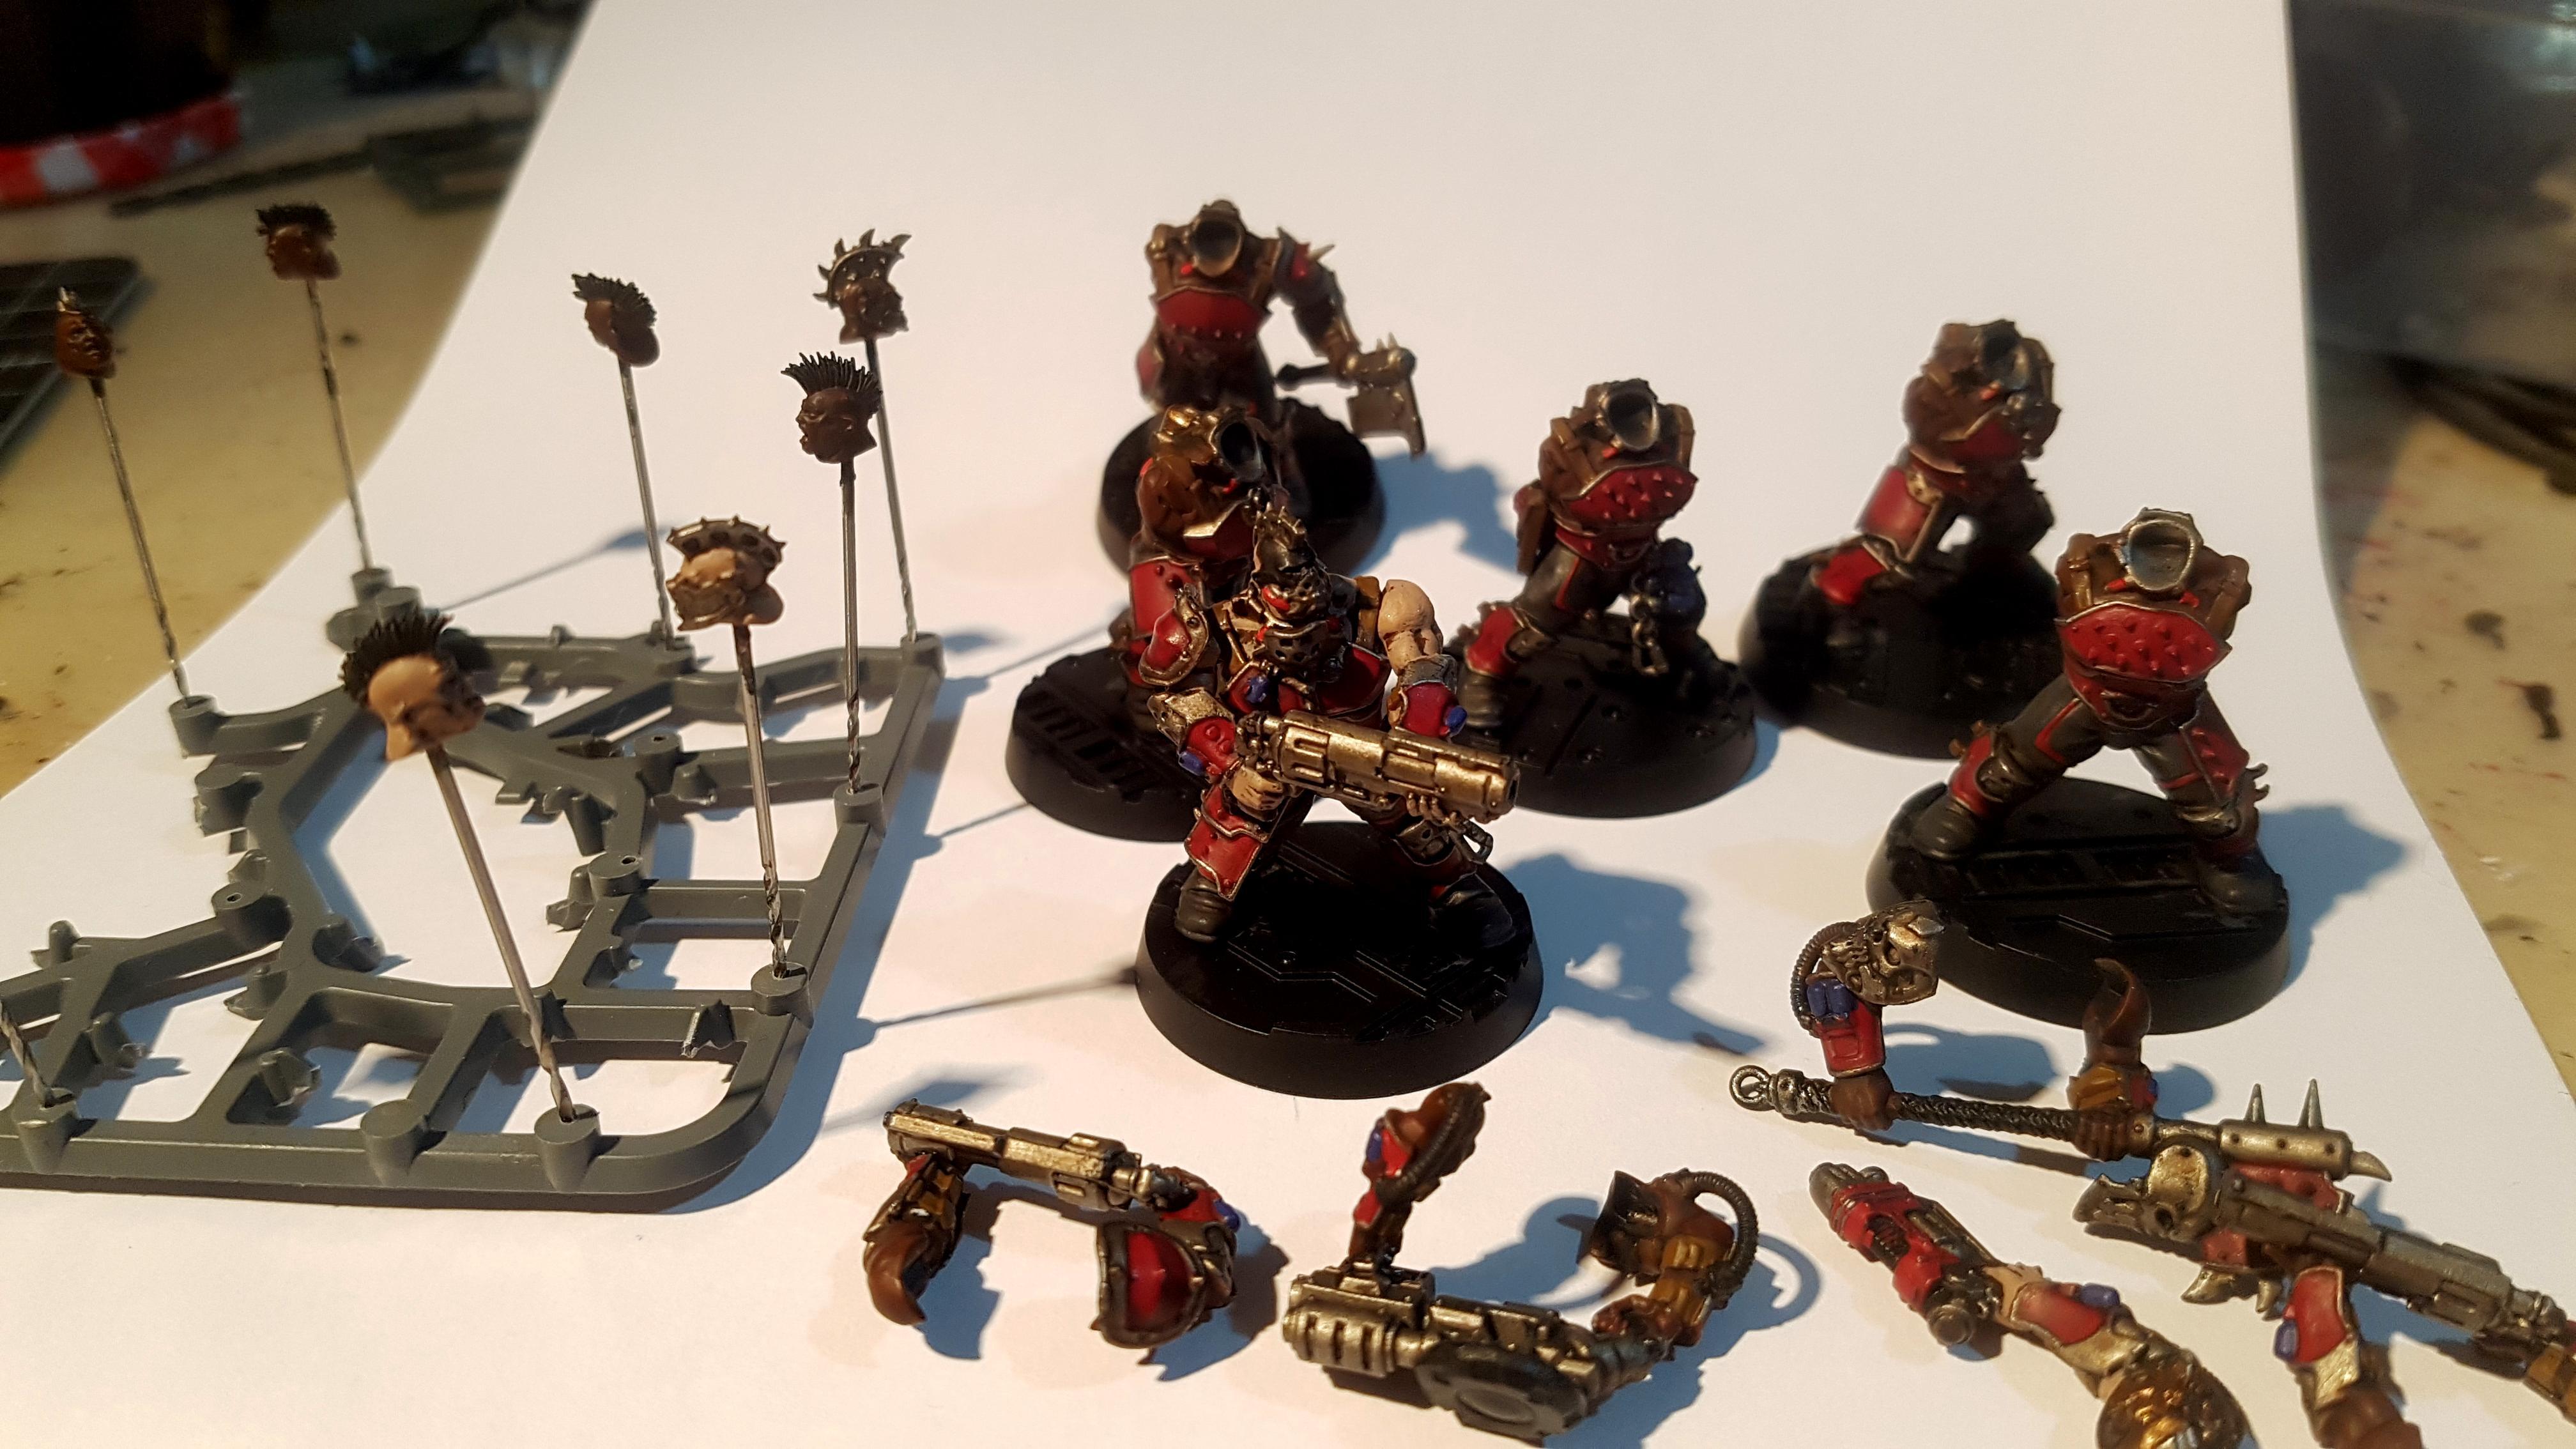 Goliaths, N17, Necromunda, Work In Progress